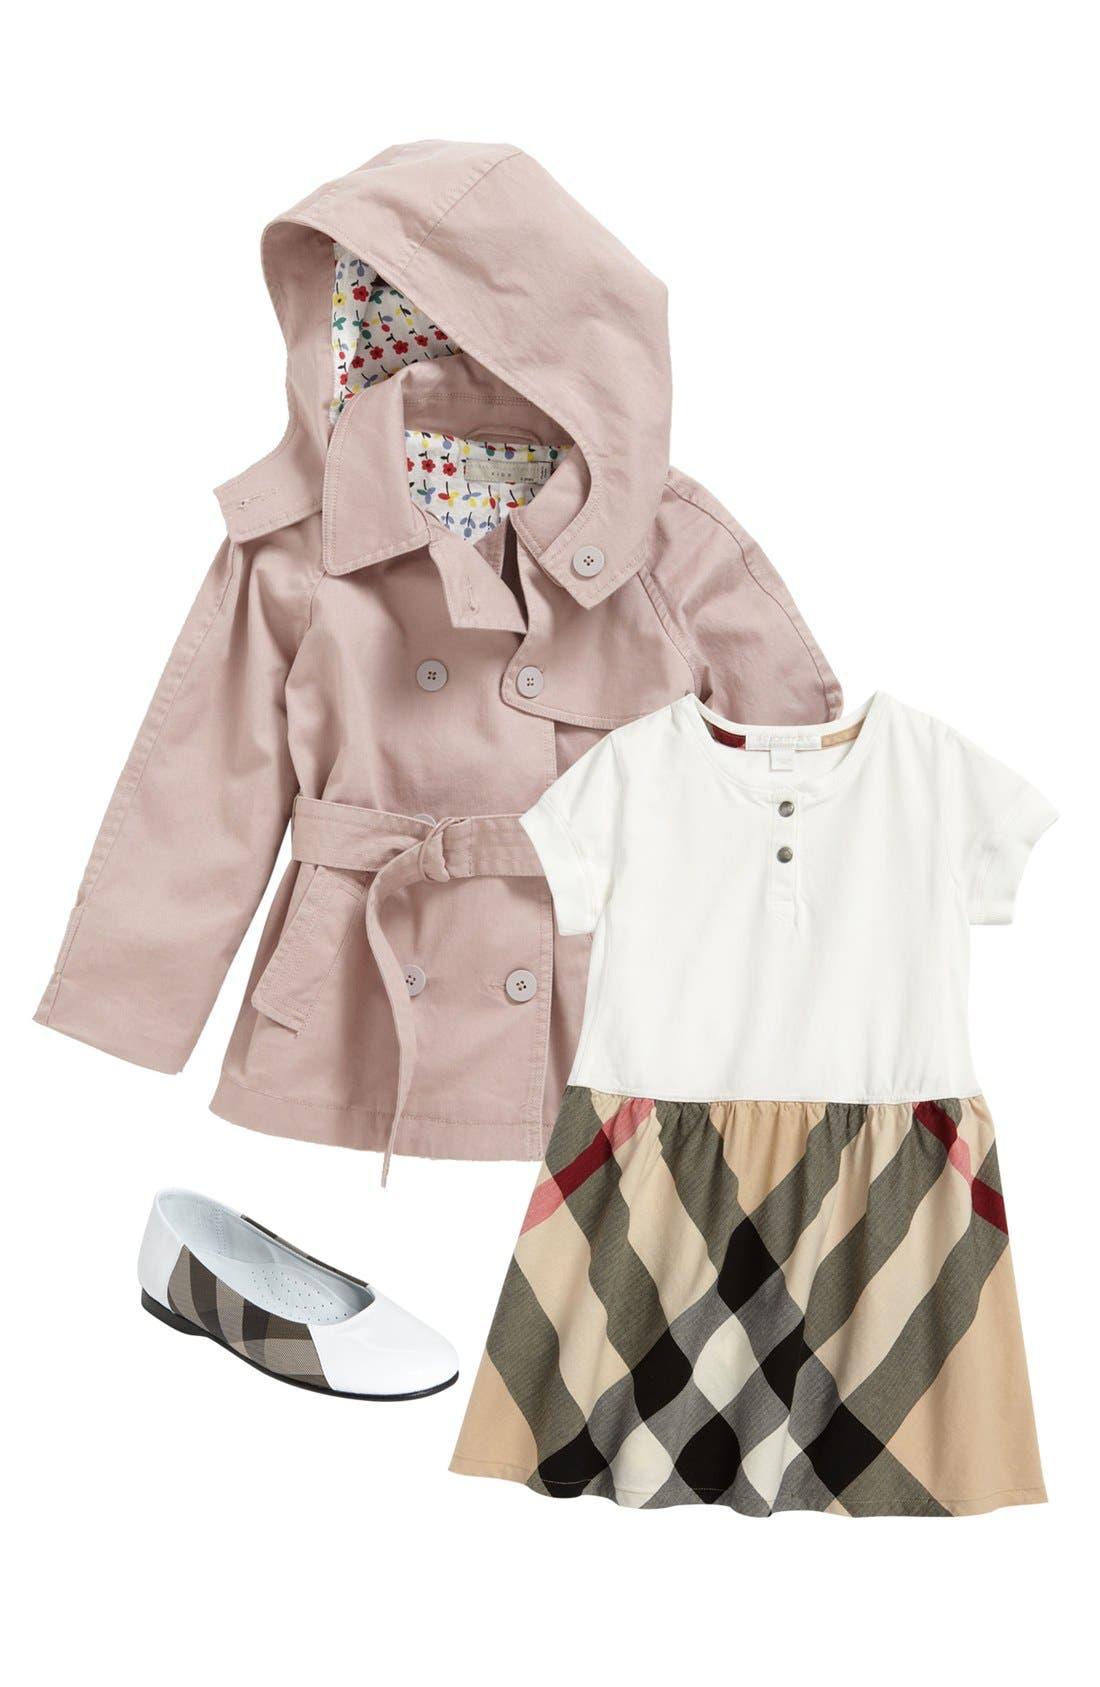 Main Image - Burberry Dress & Stella McCartney Trench Coat (Toddler)